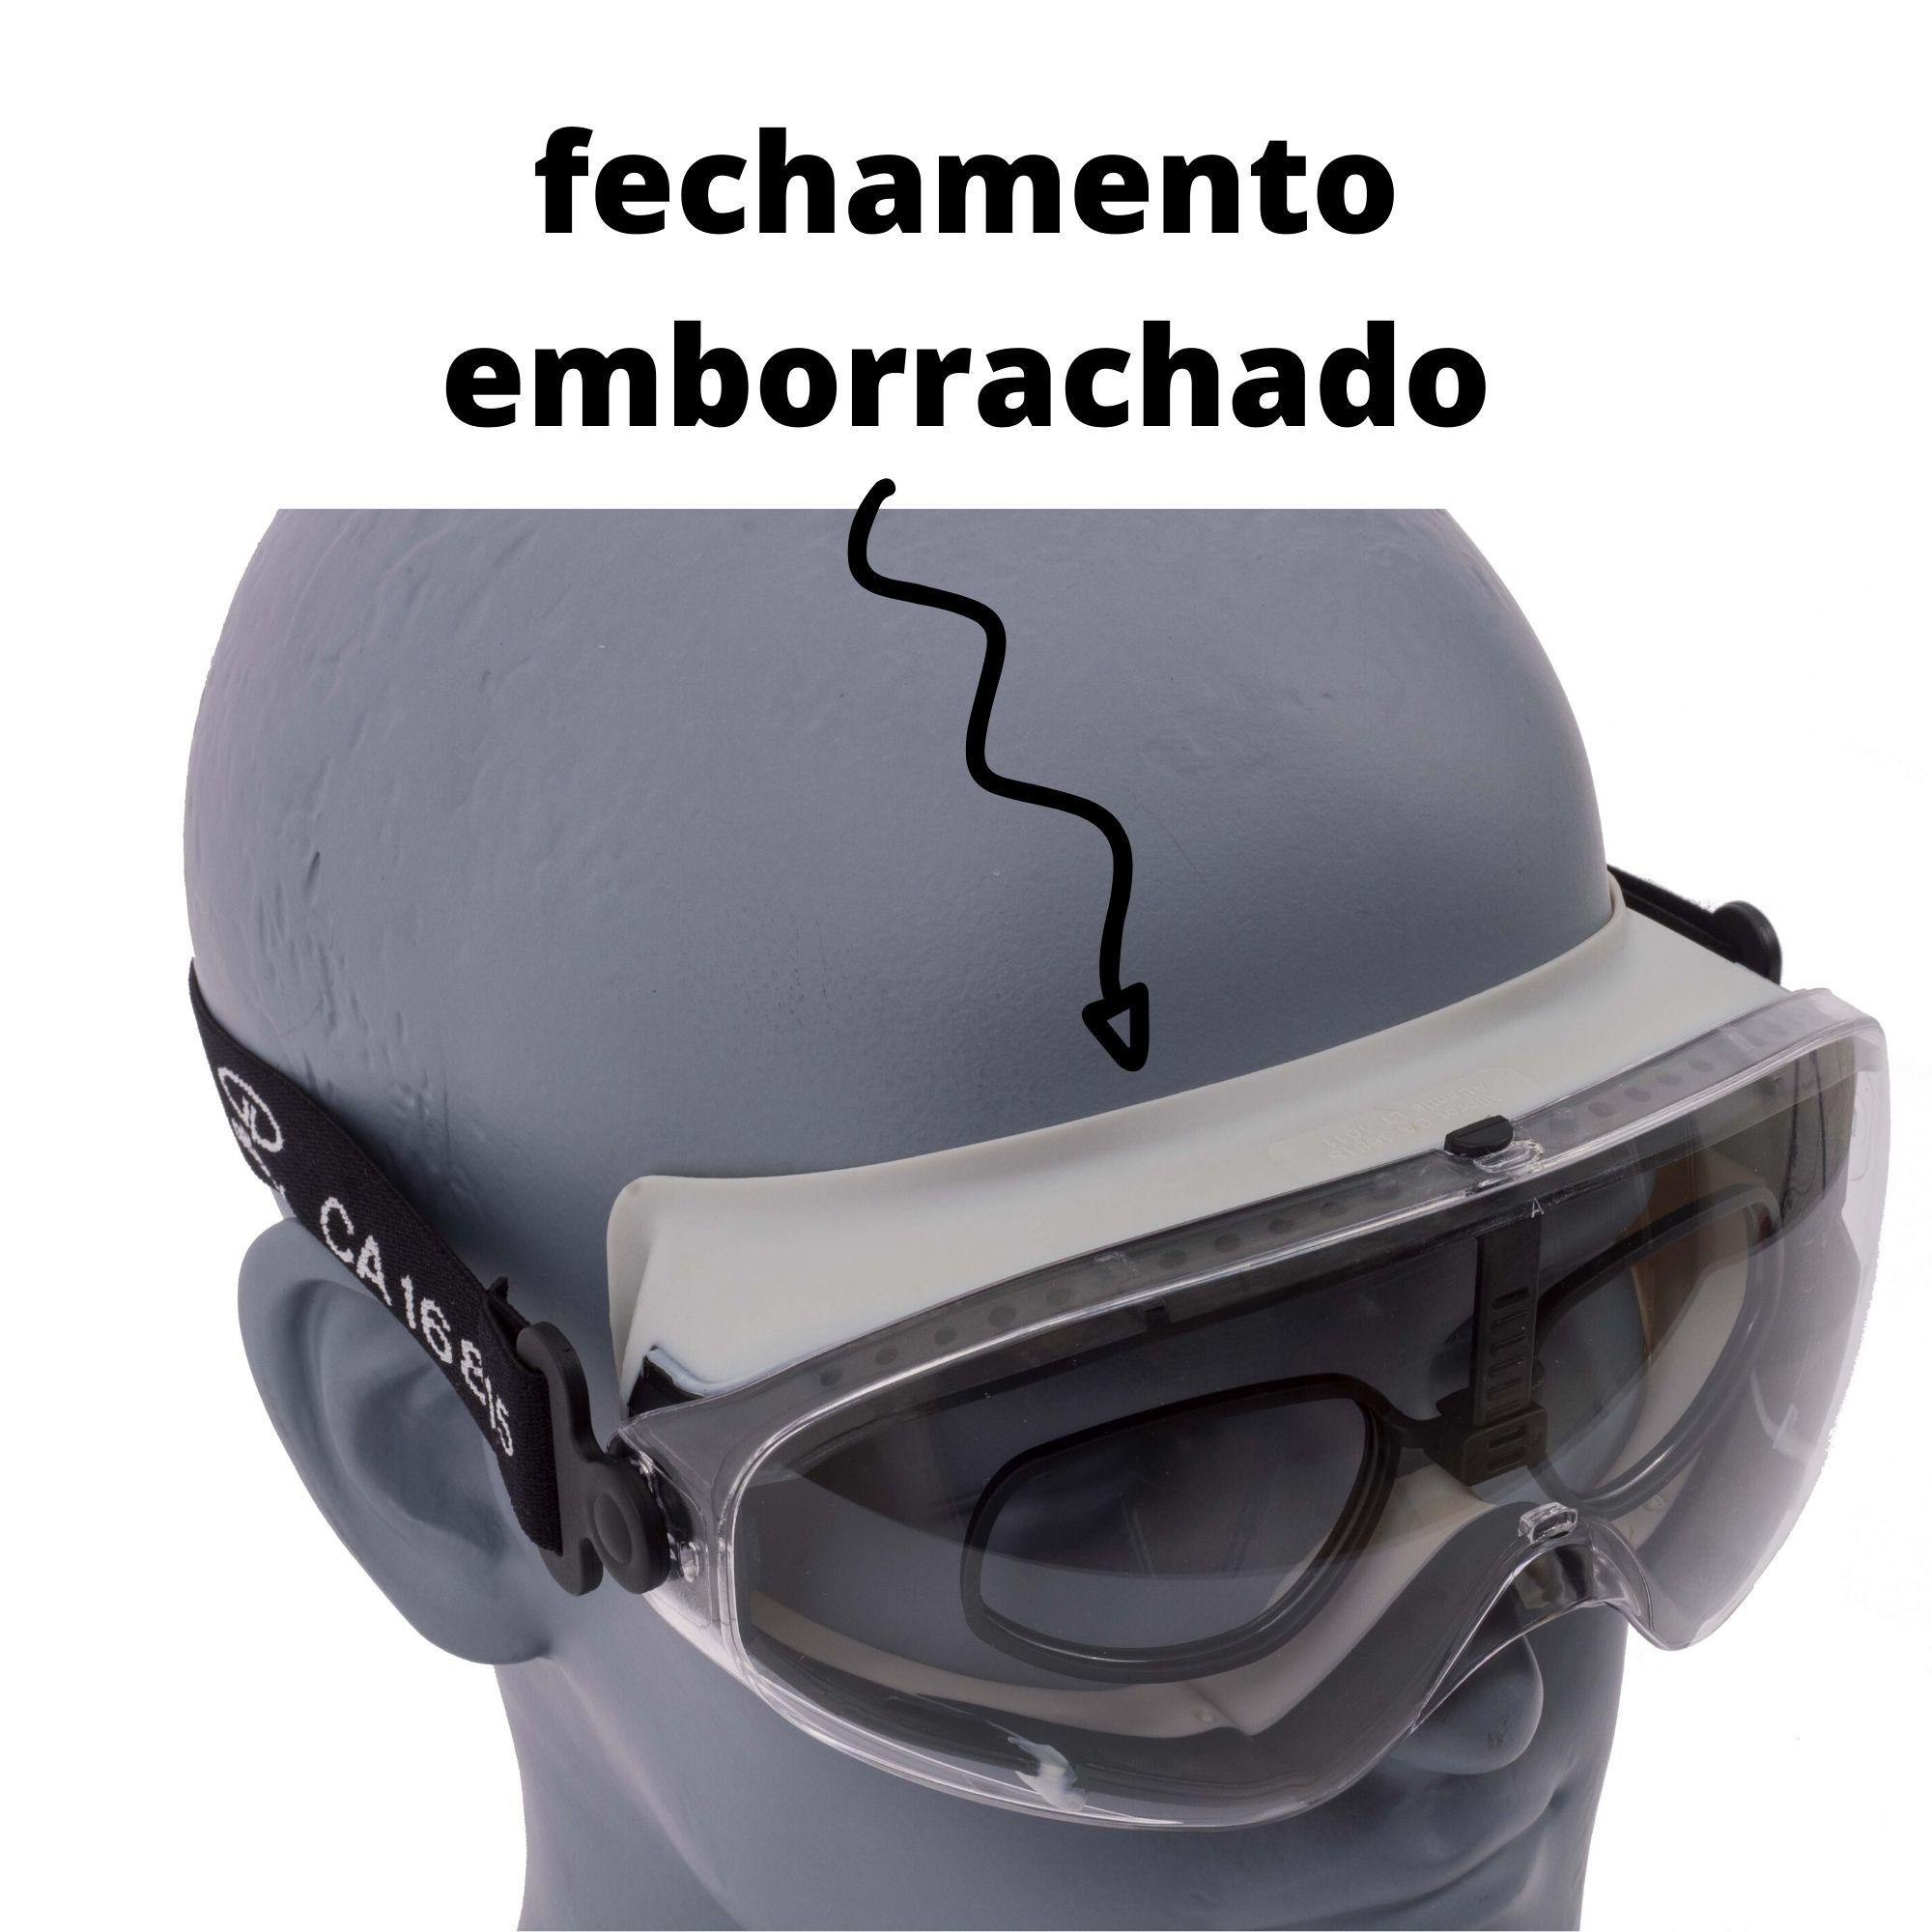 OCULOS DE SEGURANCA ATLANTIS INCOLOR  - DE PAULA EPI